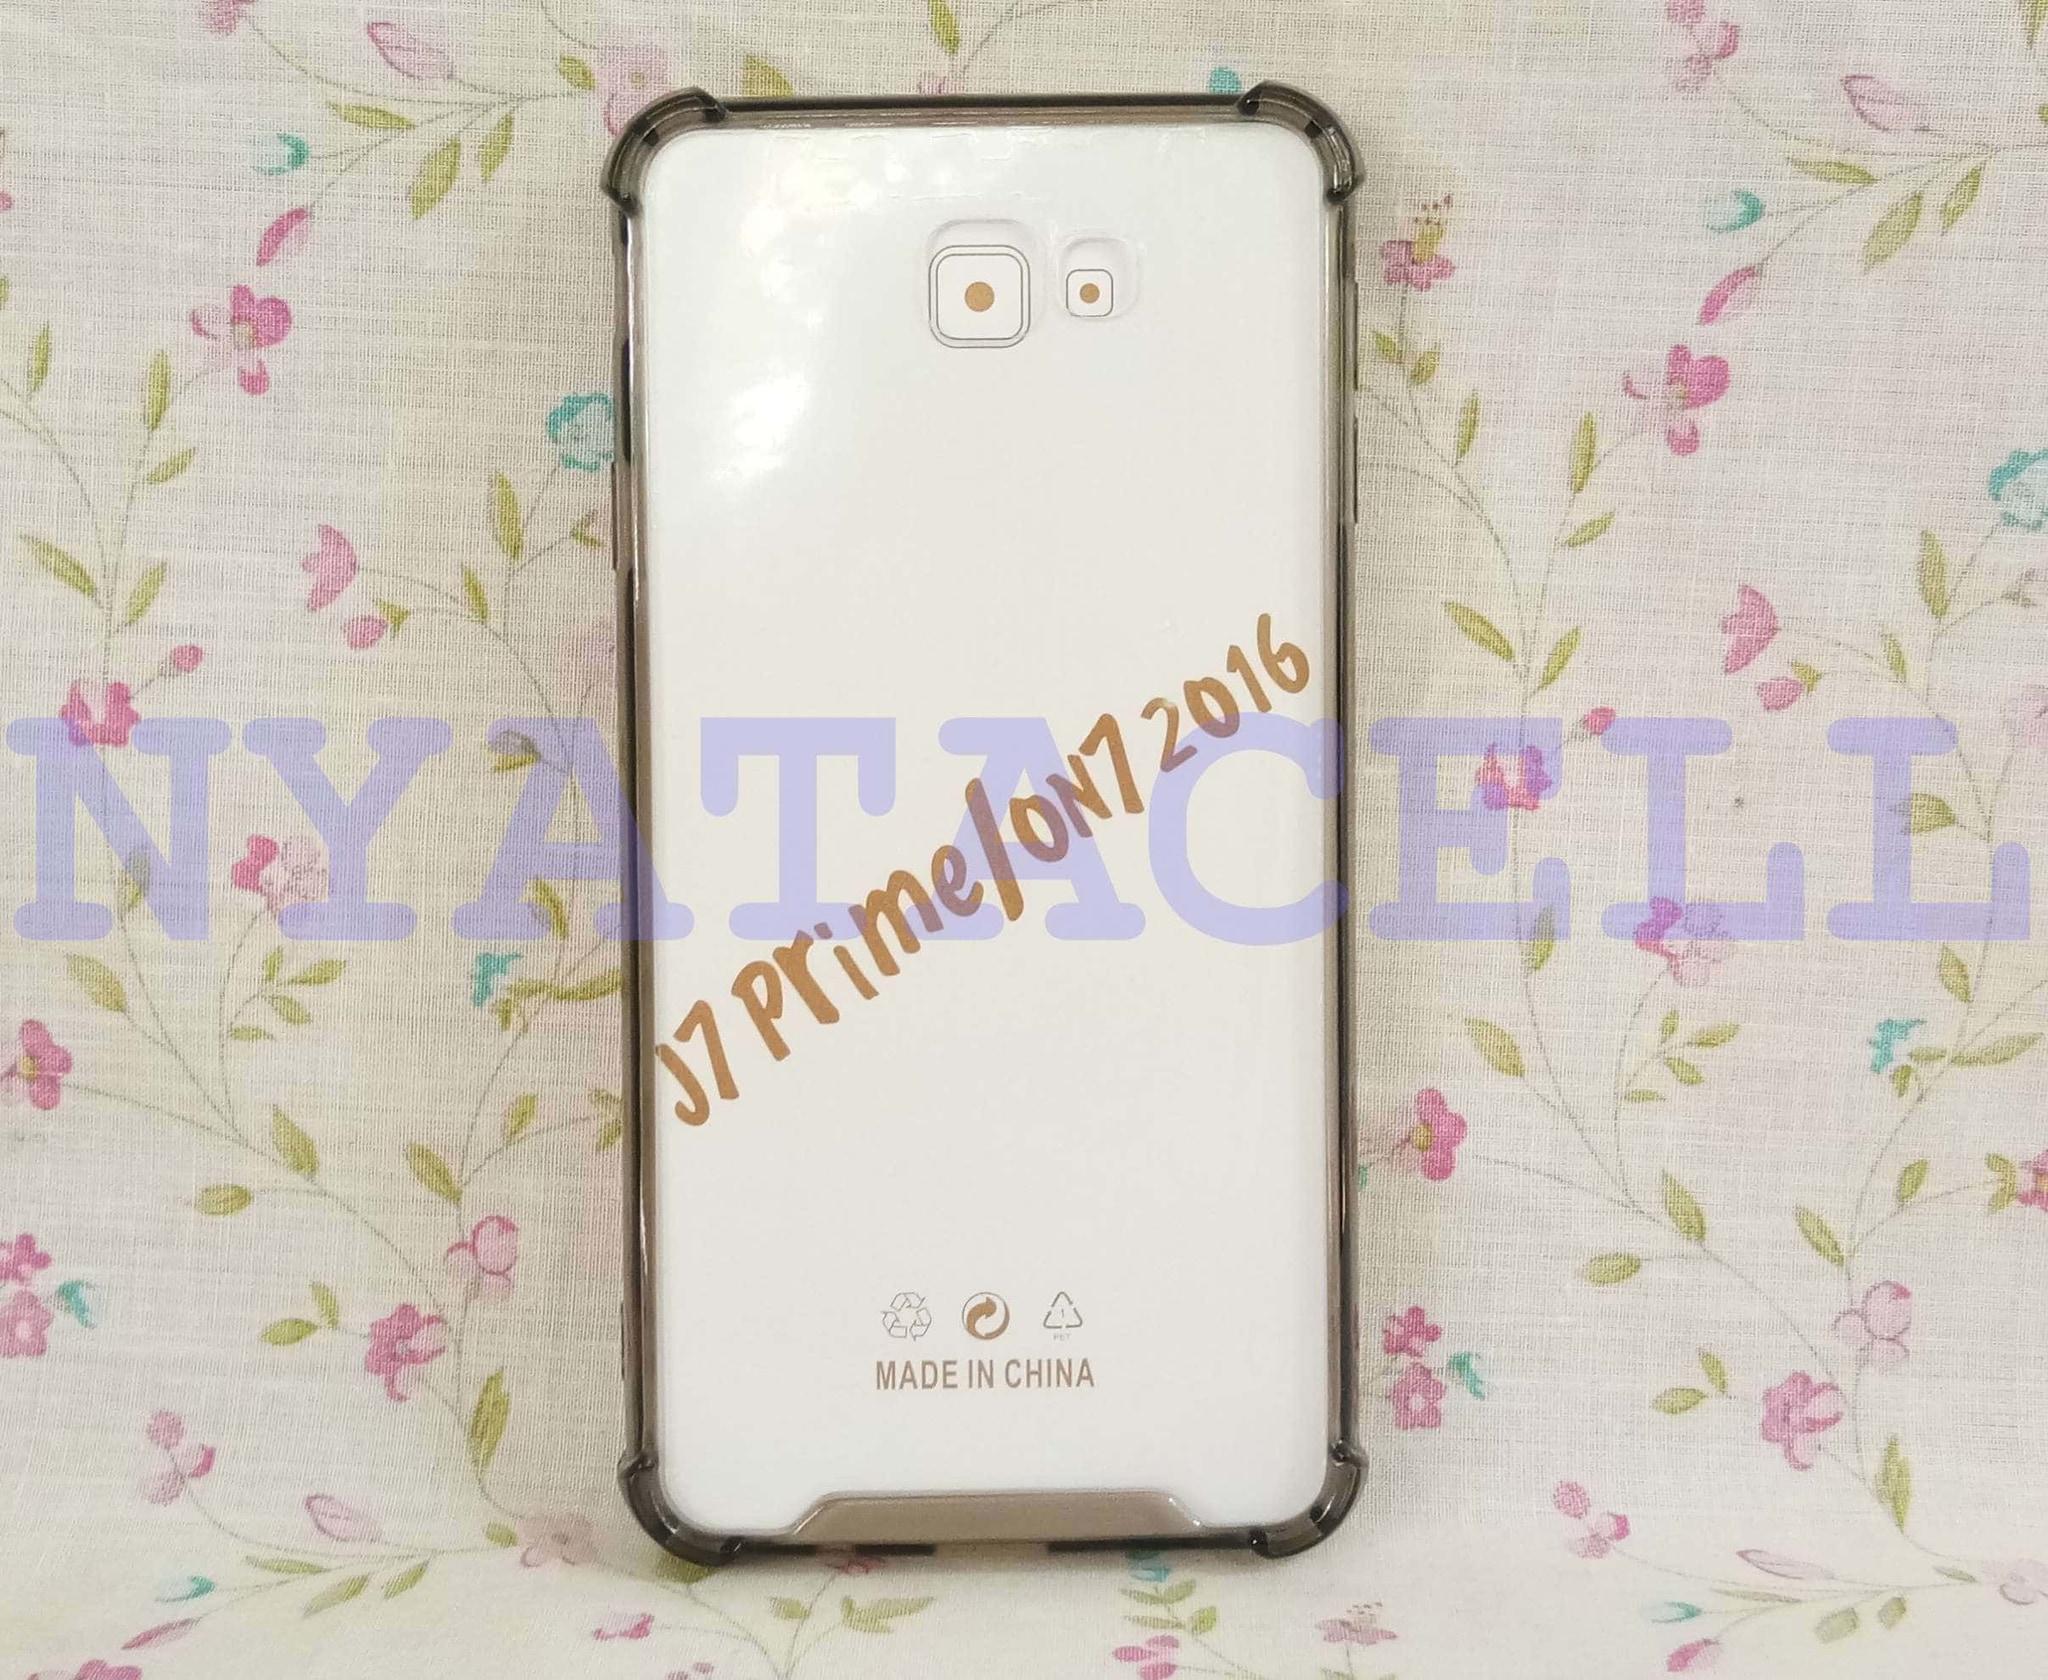 Case Anticrack Samsung J7 Prime Bening Daftar Update Harga Terbaru Peonia Transparent Acrylic Hybrid On7 Tg Fiber Galaxy Anti Crack Shock Knock